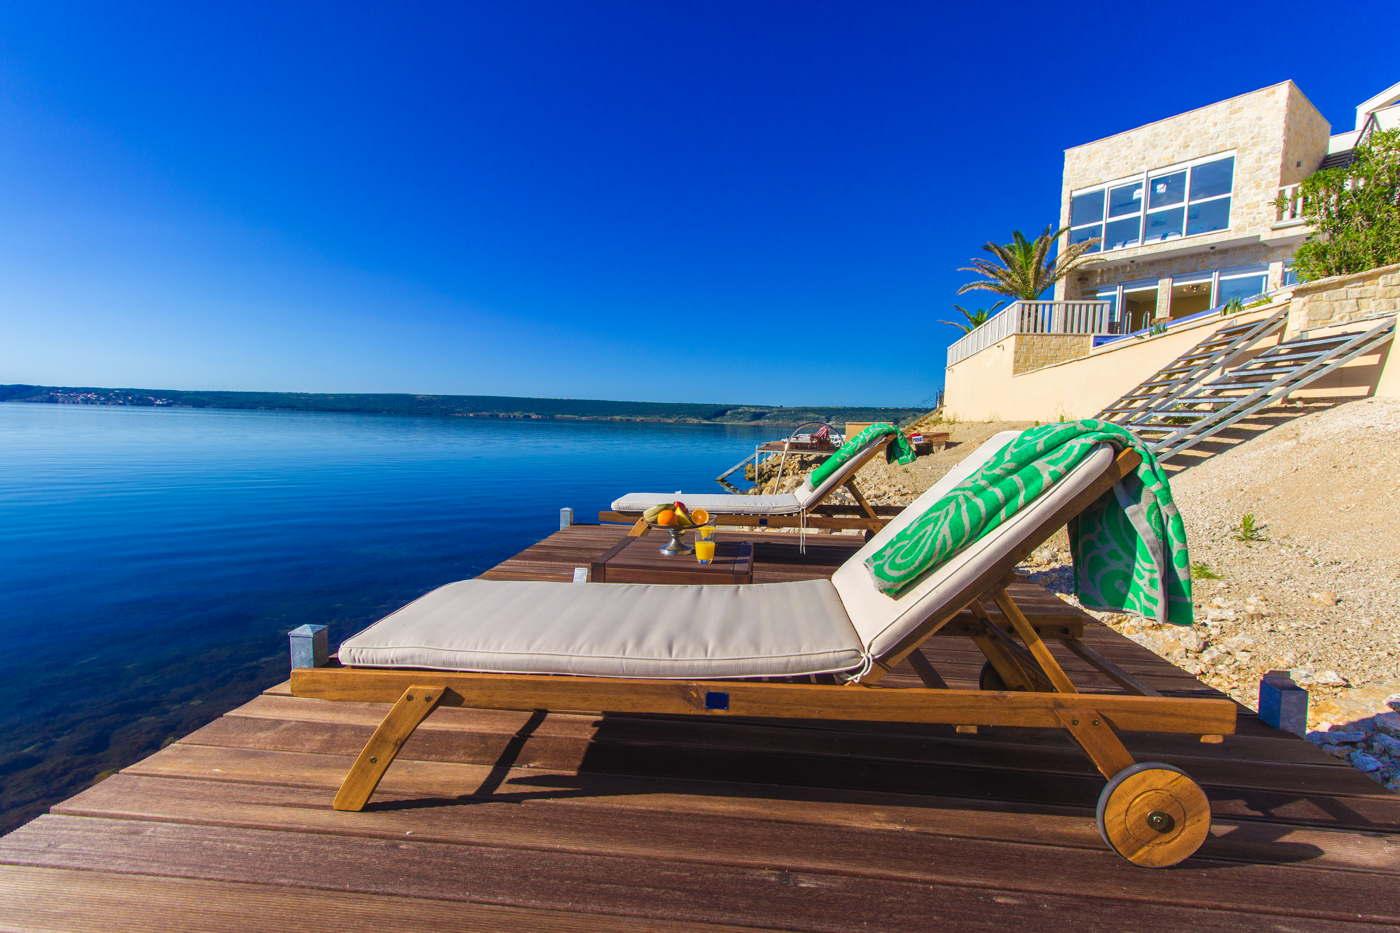 Ferienvilla good cama am meer mit pool badesteg am for Kroatien villa mit pool